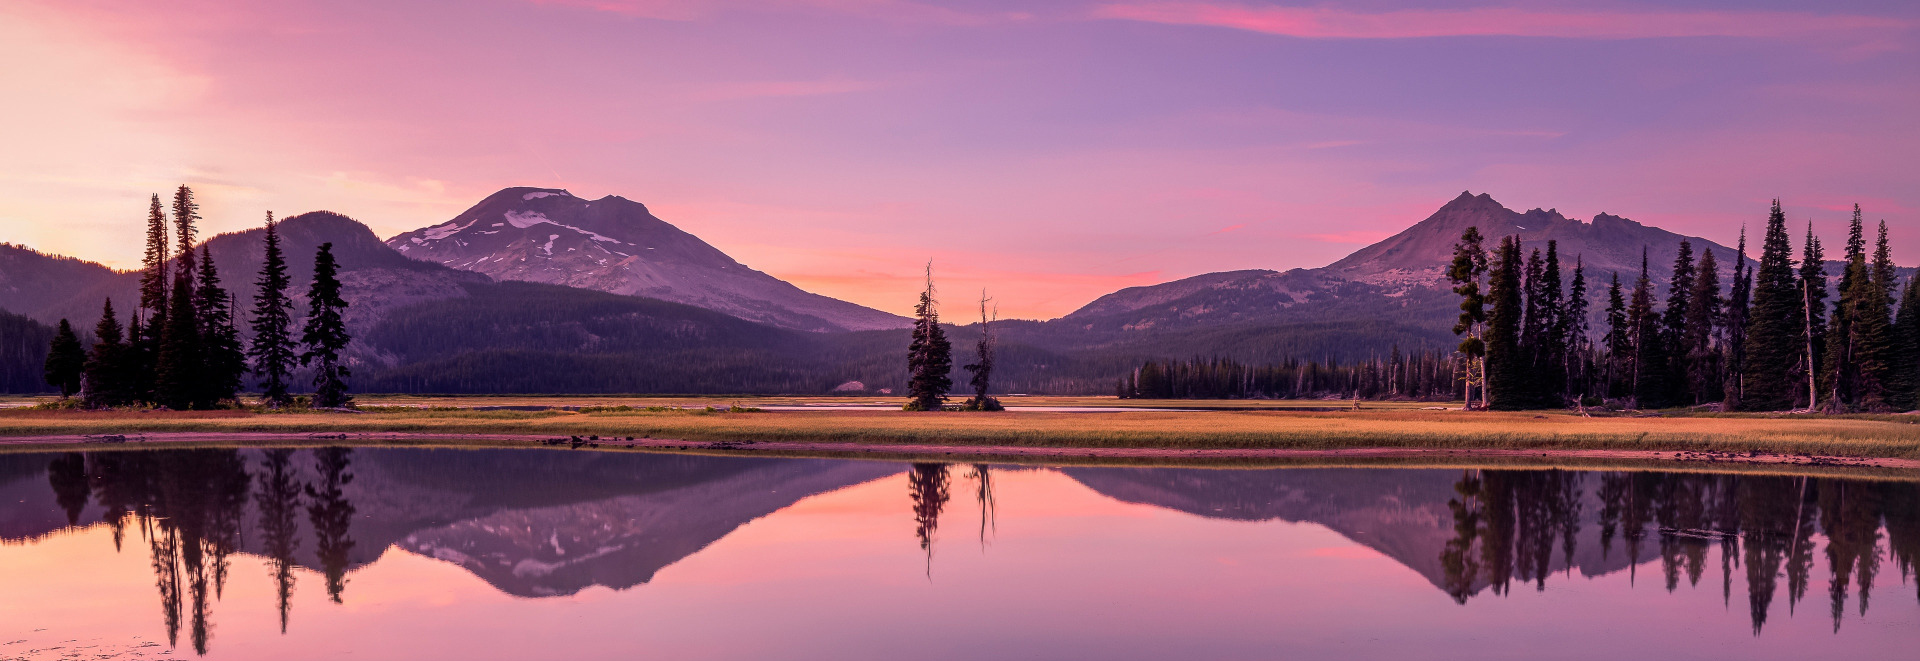 Image of the Oregon Cascade Mountain Range